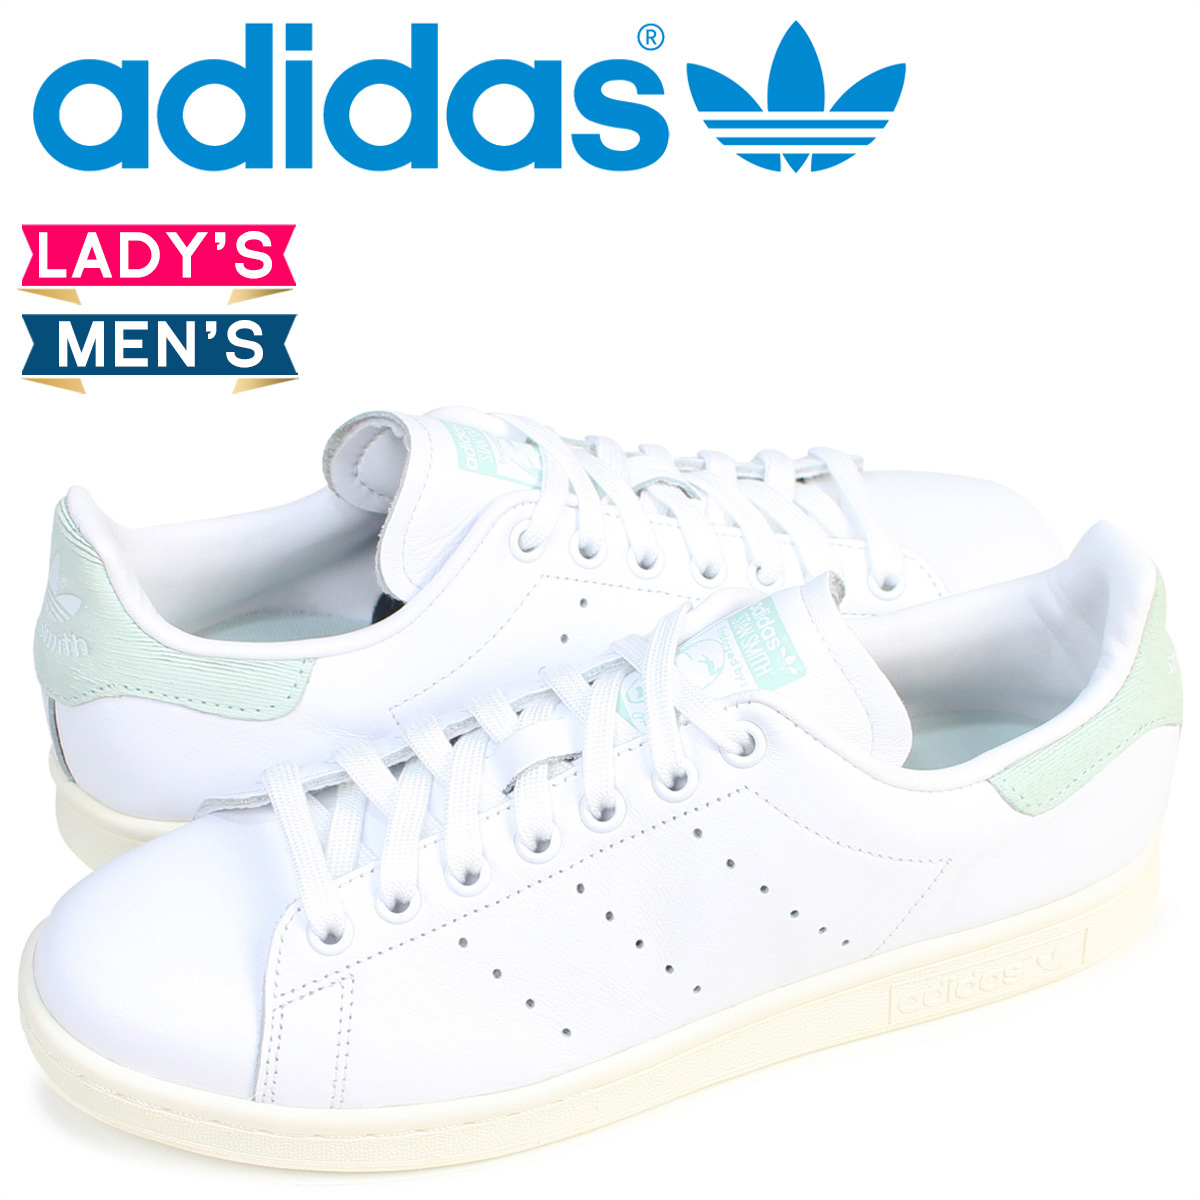 Whats up Sports | Rakuten Global Market: Adidas Stan Smith adidas originals sneakers STAN SMITH Lady's men BB5047 shoes white [7/21 Shinnyu load]